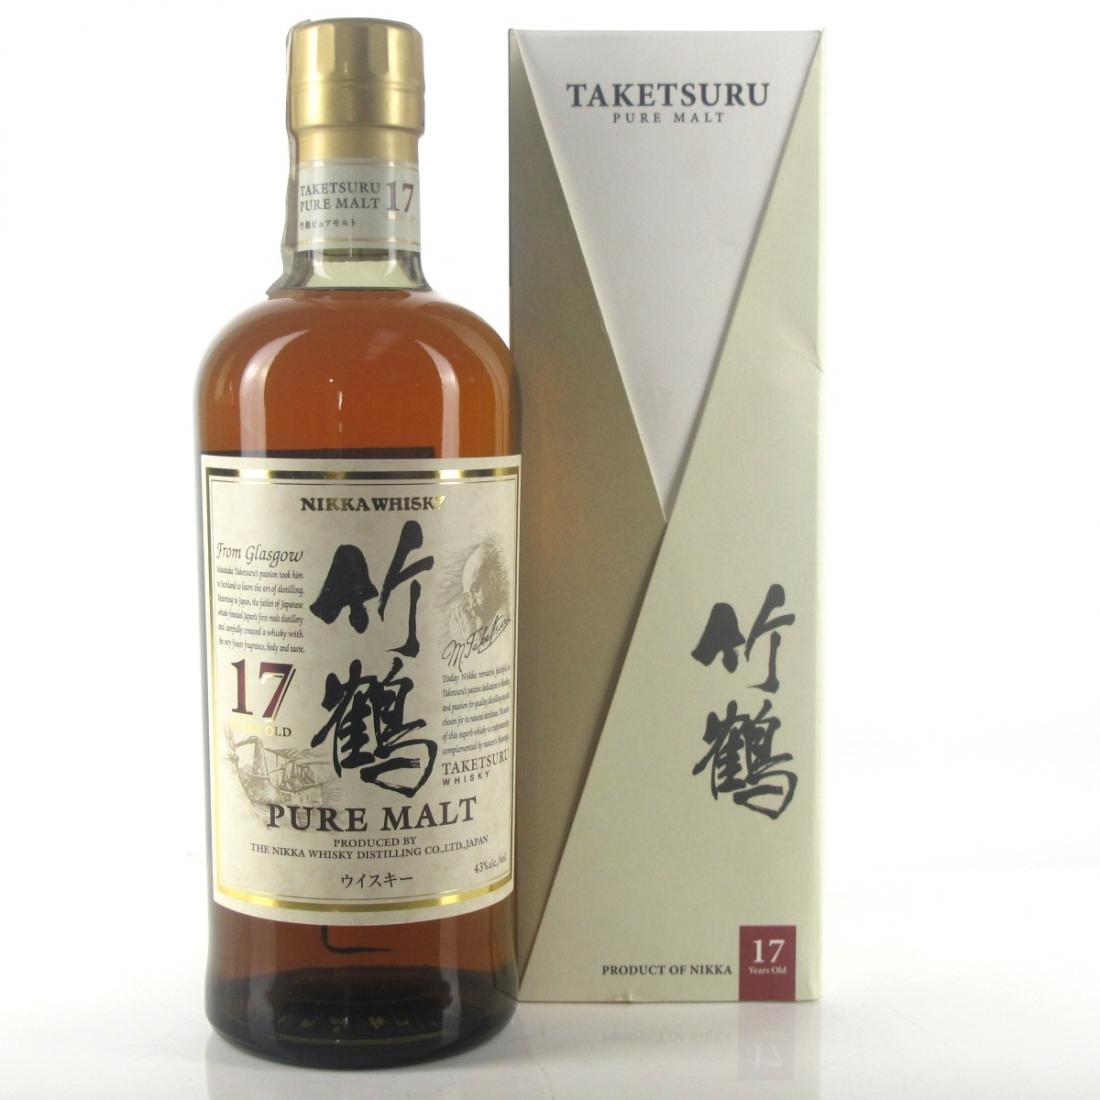 Taketsuru 17 Year Old